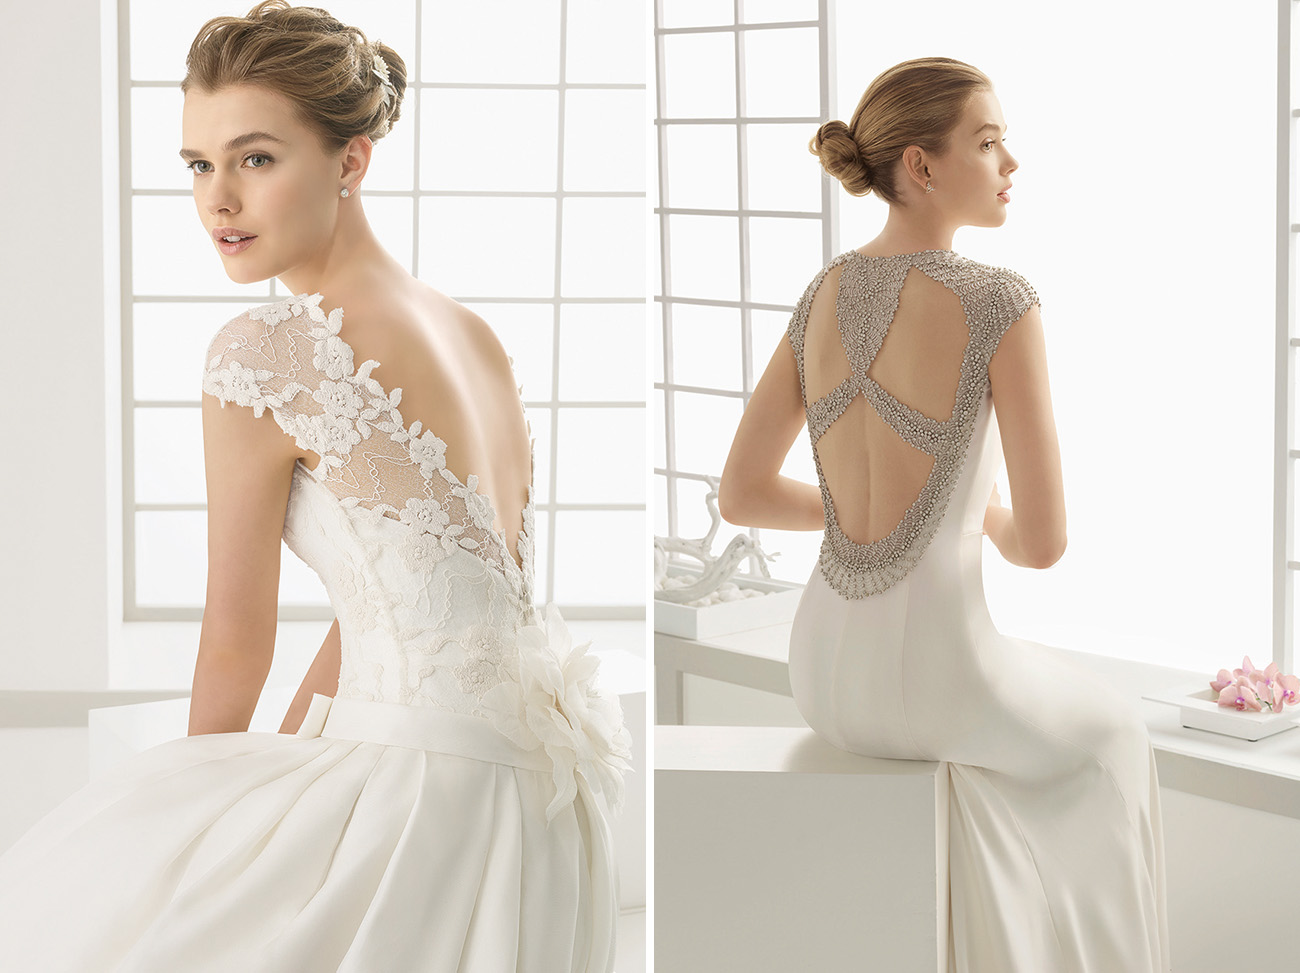 wedding dresses wetherill park jcpenney wedding dresses outlet Rosa Clara Wedding Dresses Outlet Dress Ideas